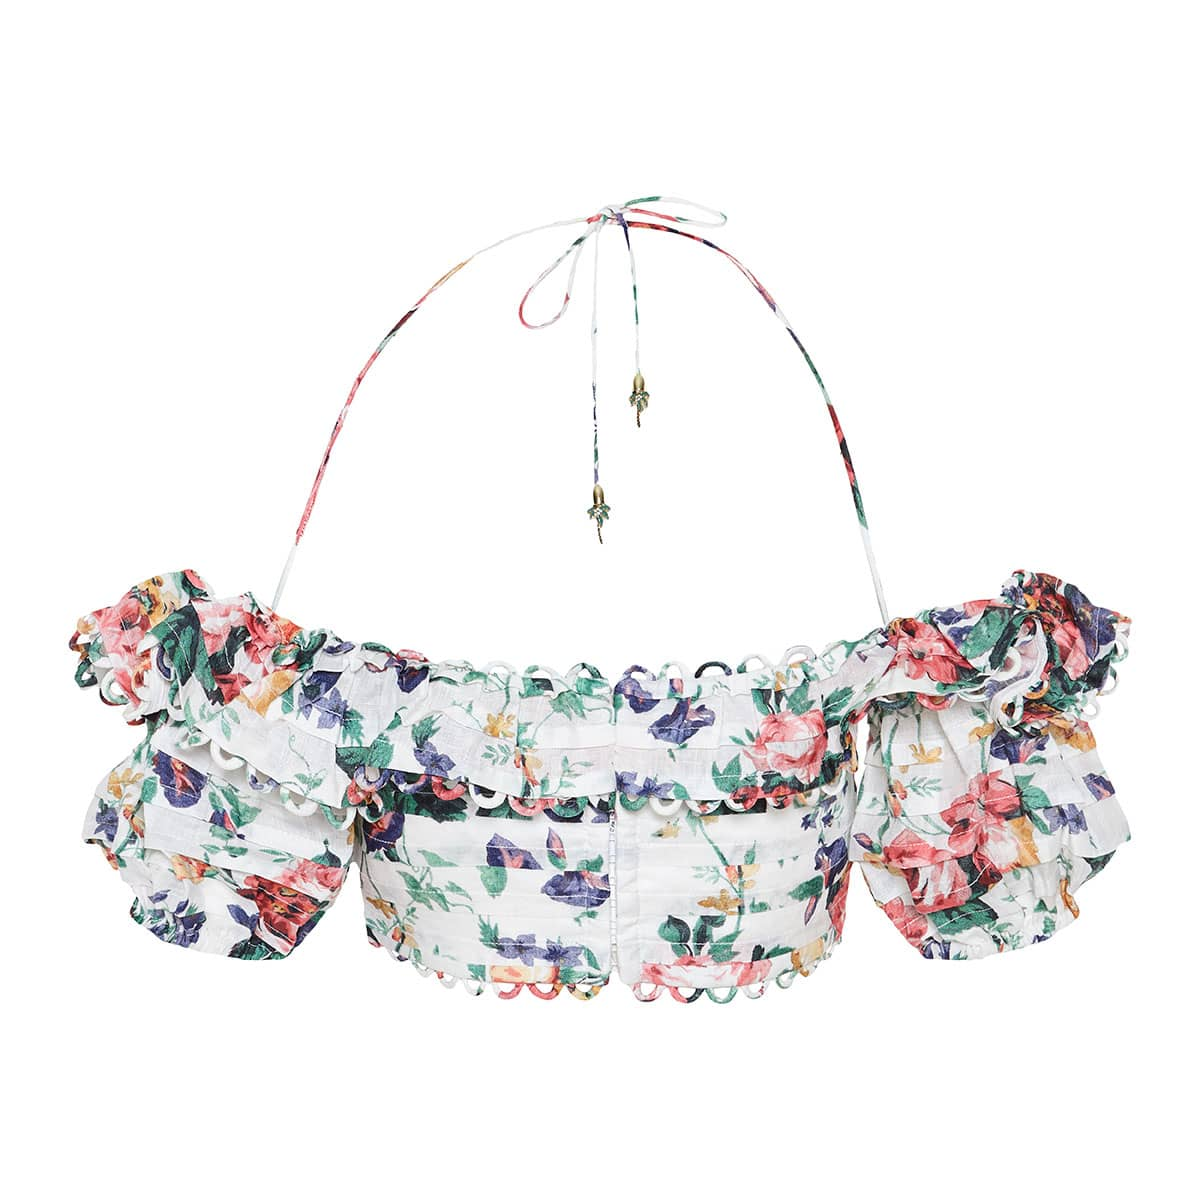 Allia floral linen cropped top